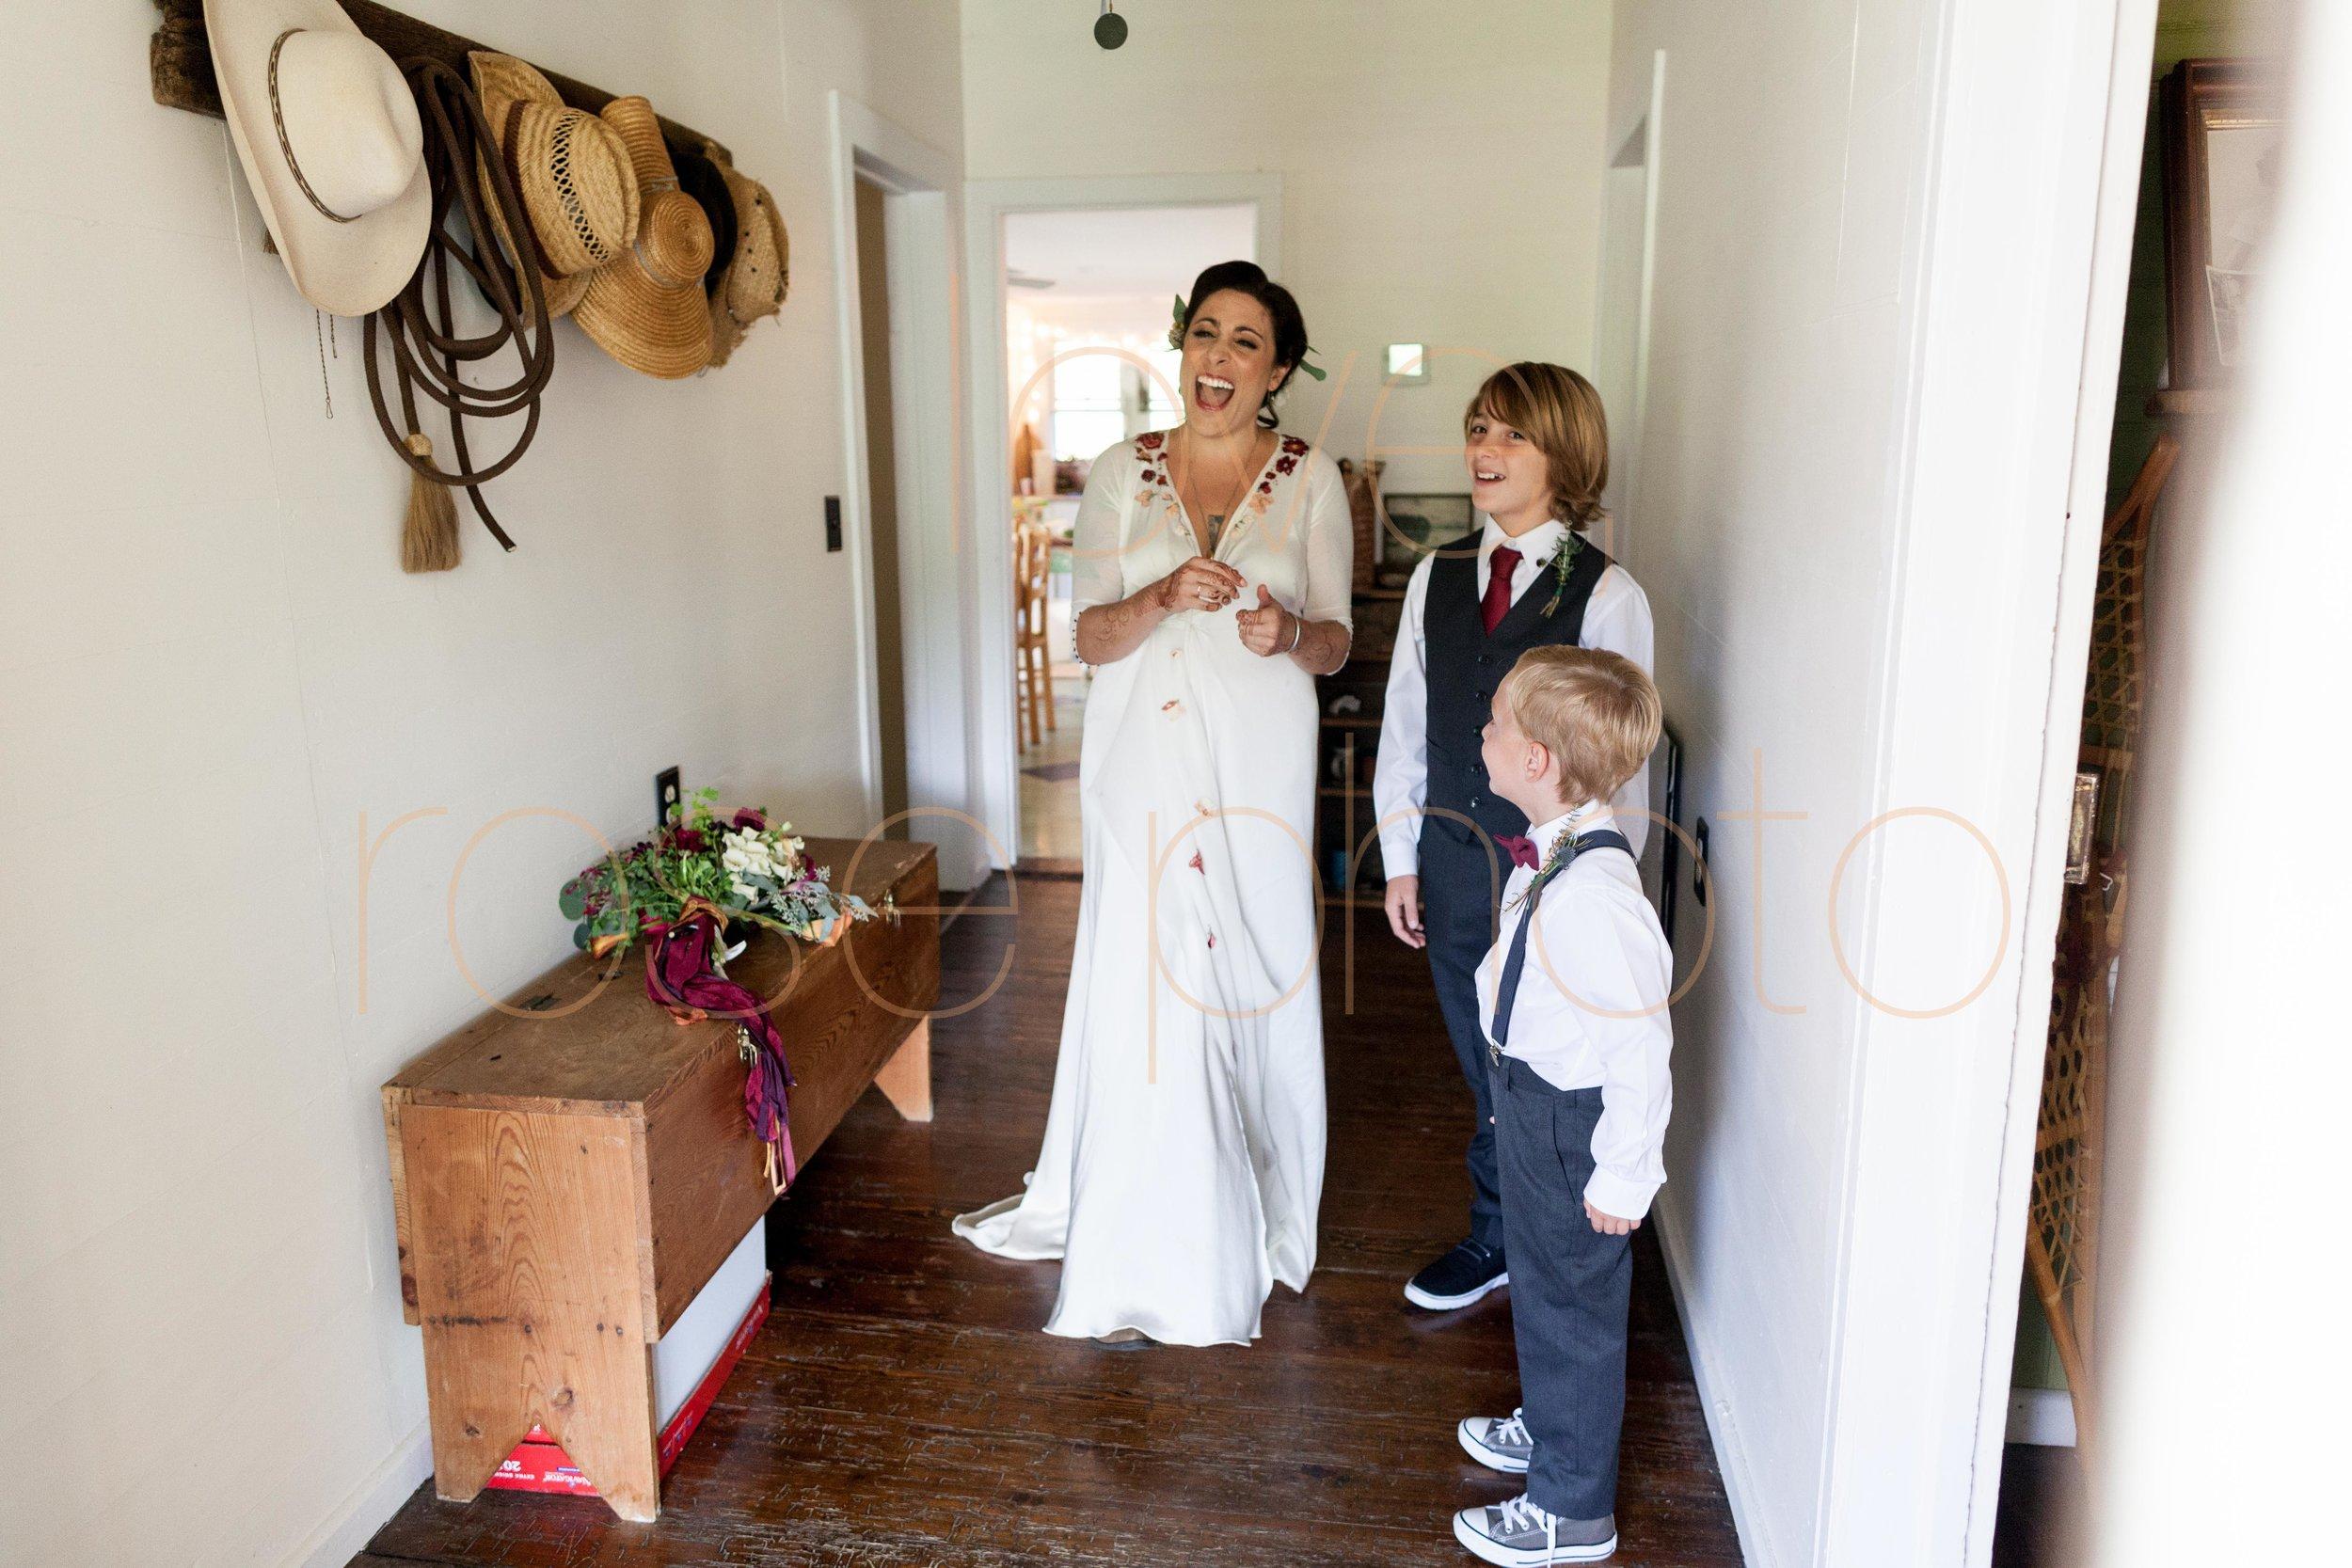 Jane Krame + Jason Ashevegas married asheville best wedding photographers -38.jpg